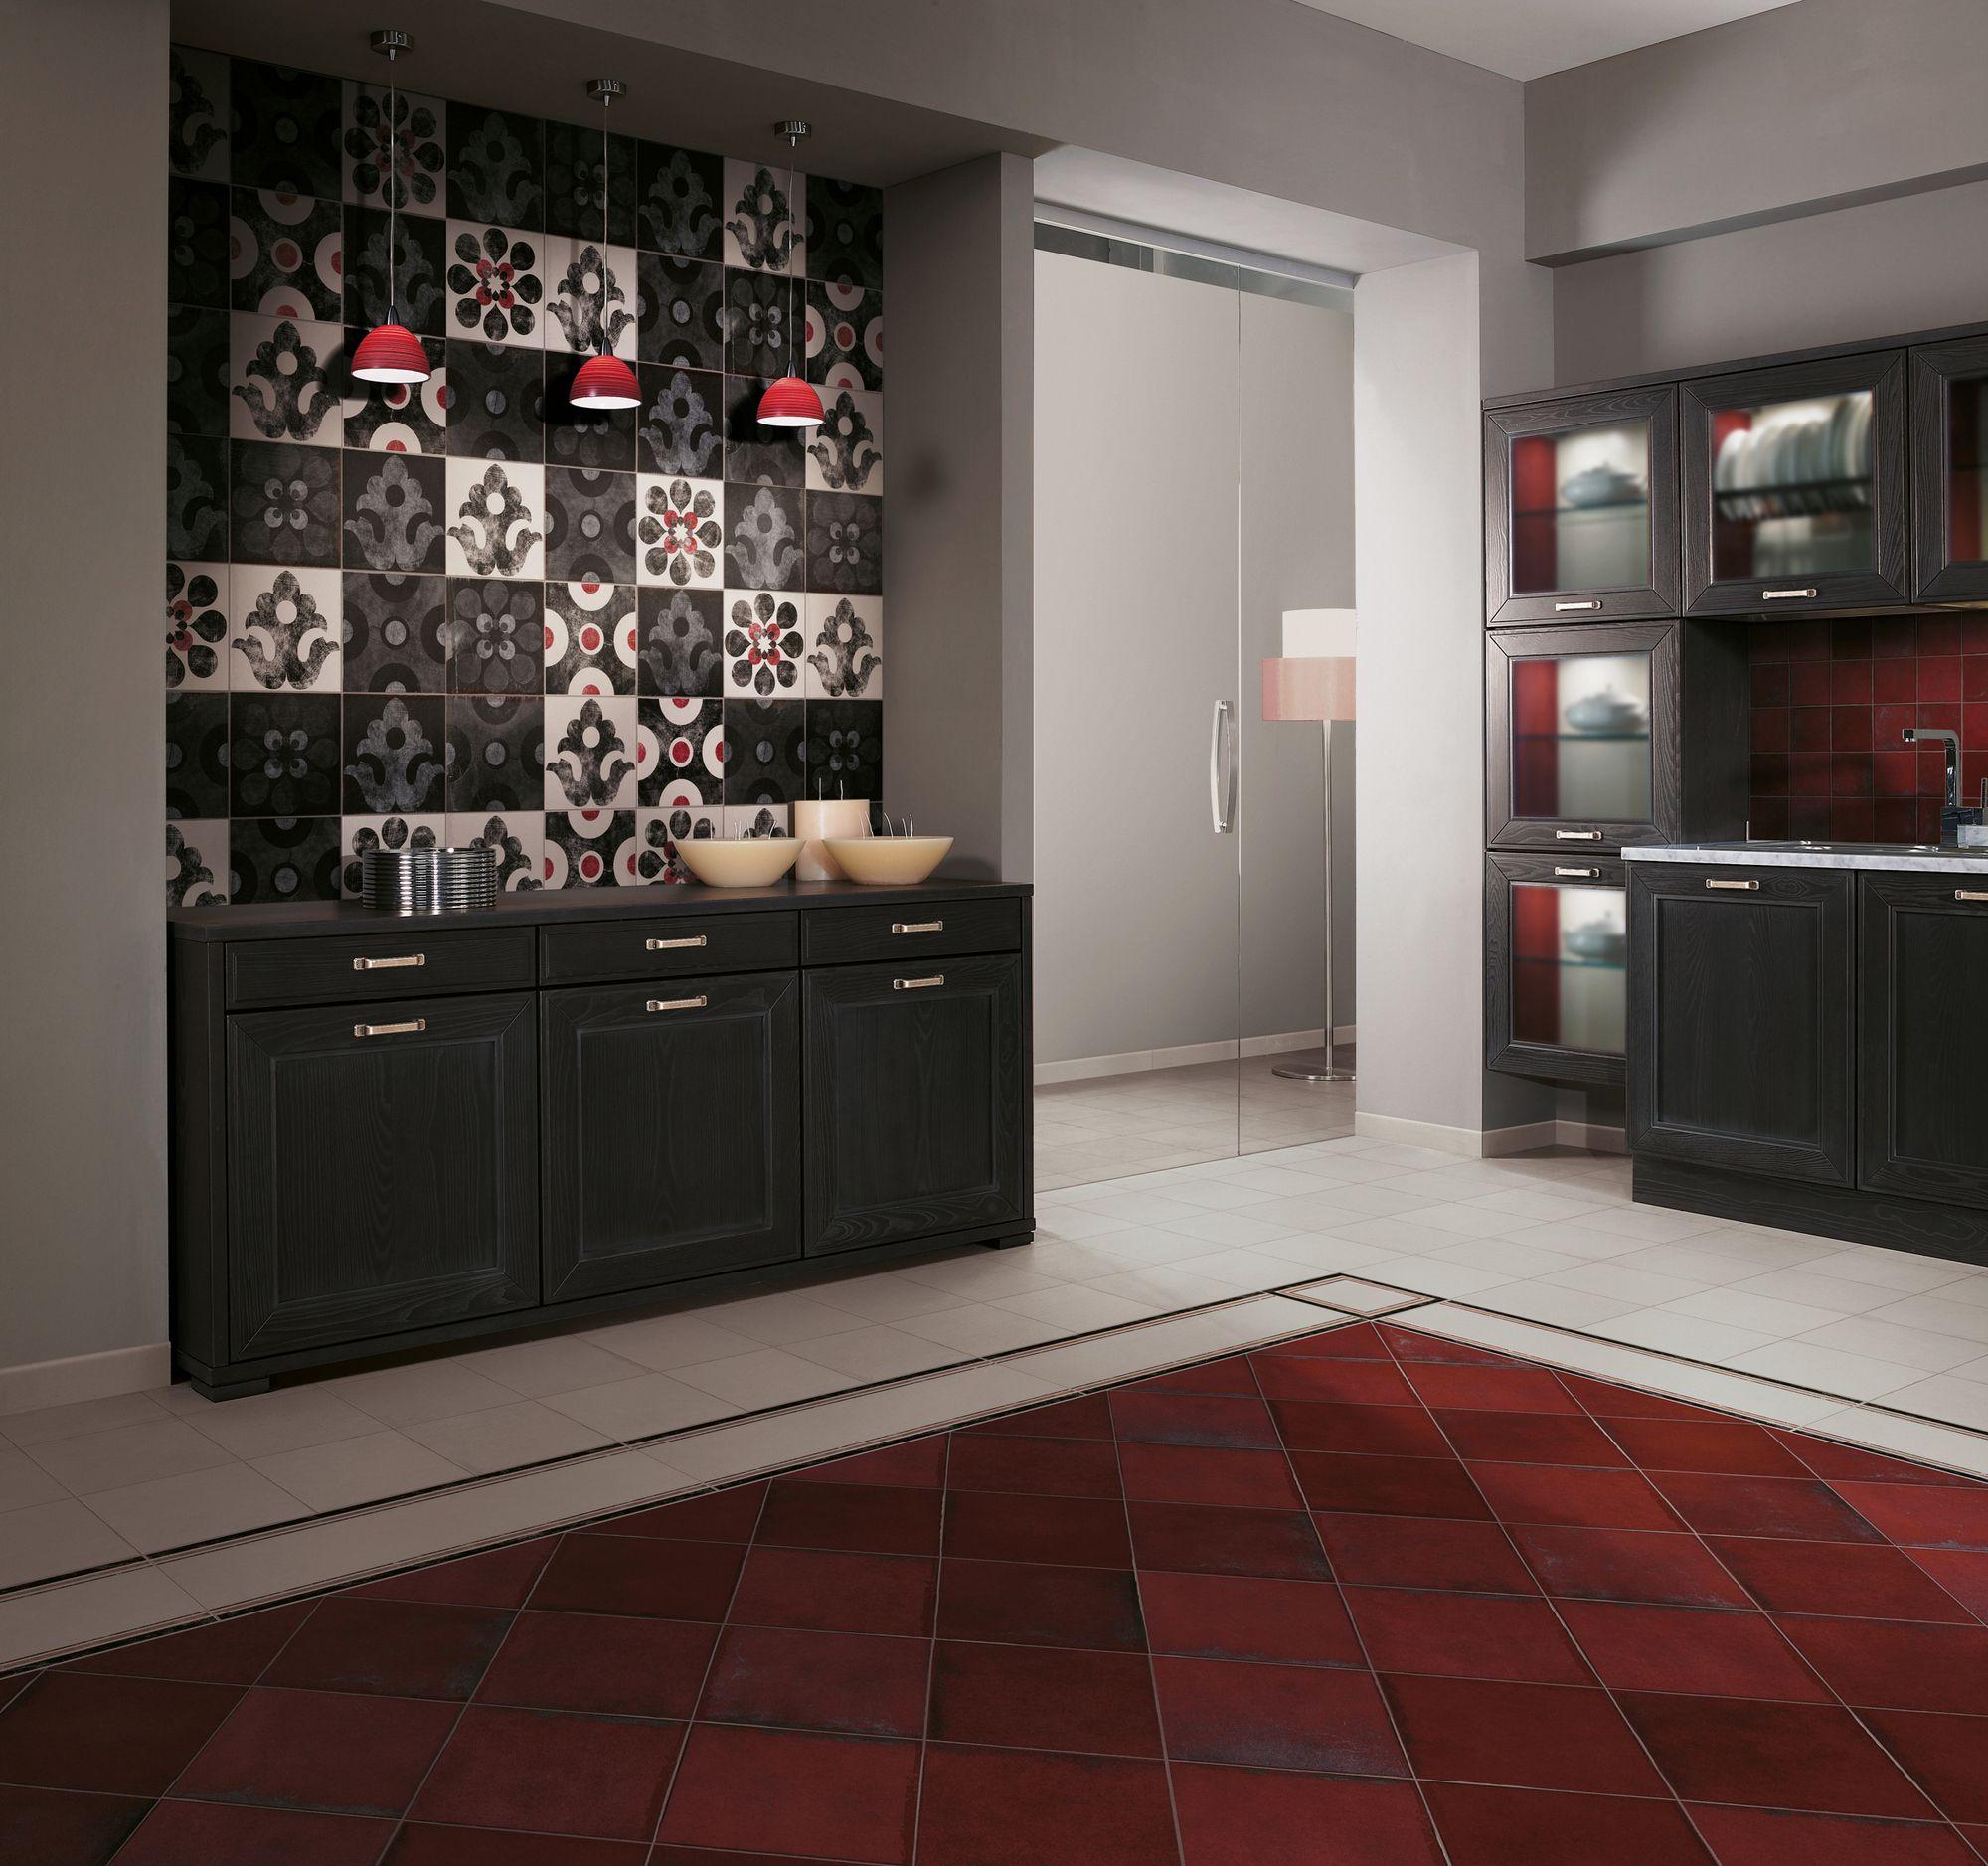 via emilia wandbelag by cir. Black Bedroom Furniture Sets. Home Design Ideas